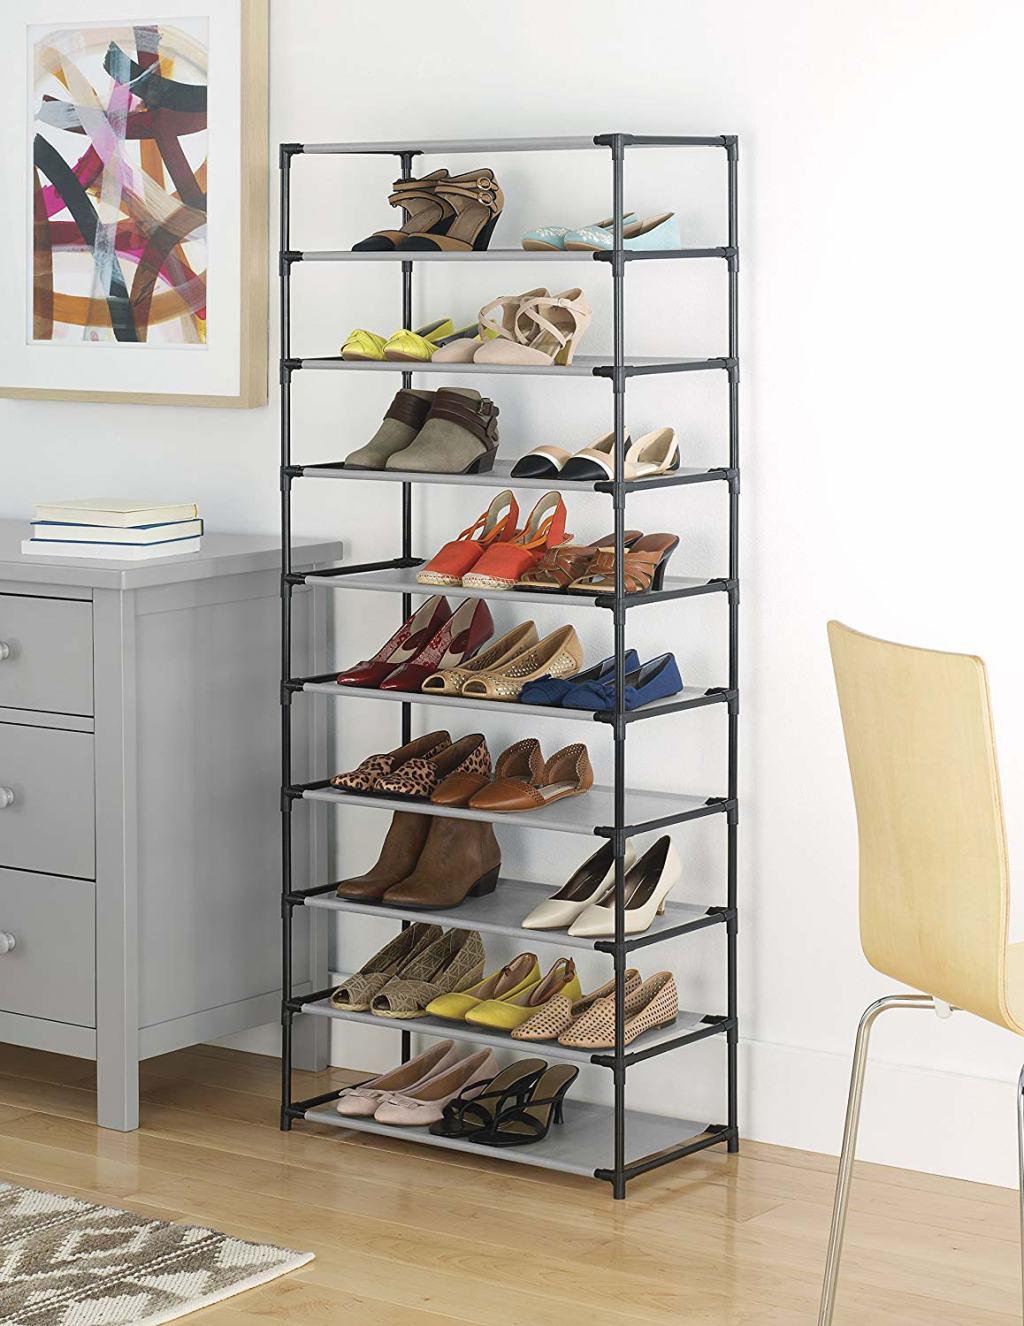 Whitmor Shoe Shelf shown stocked with shoes